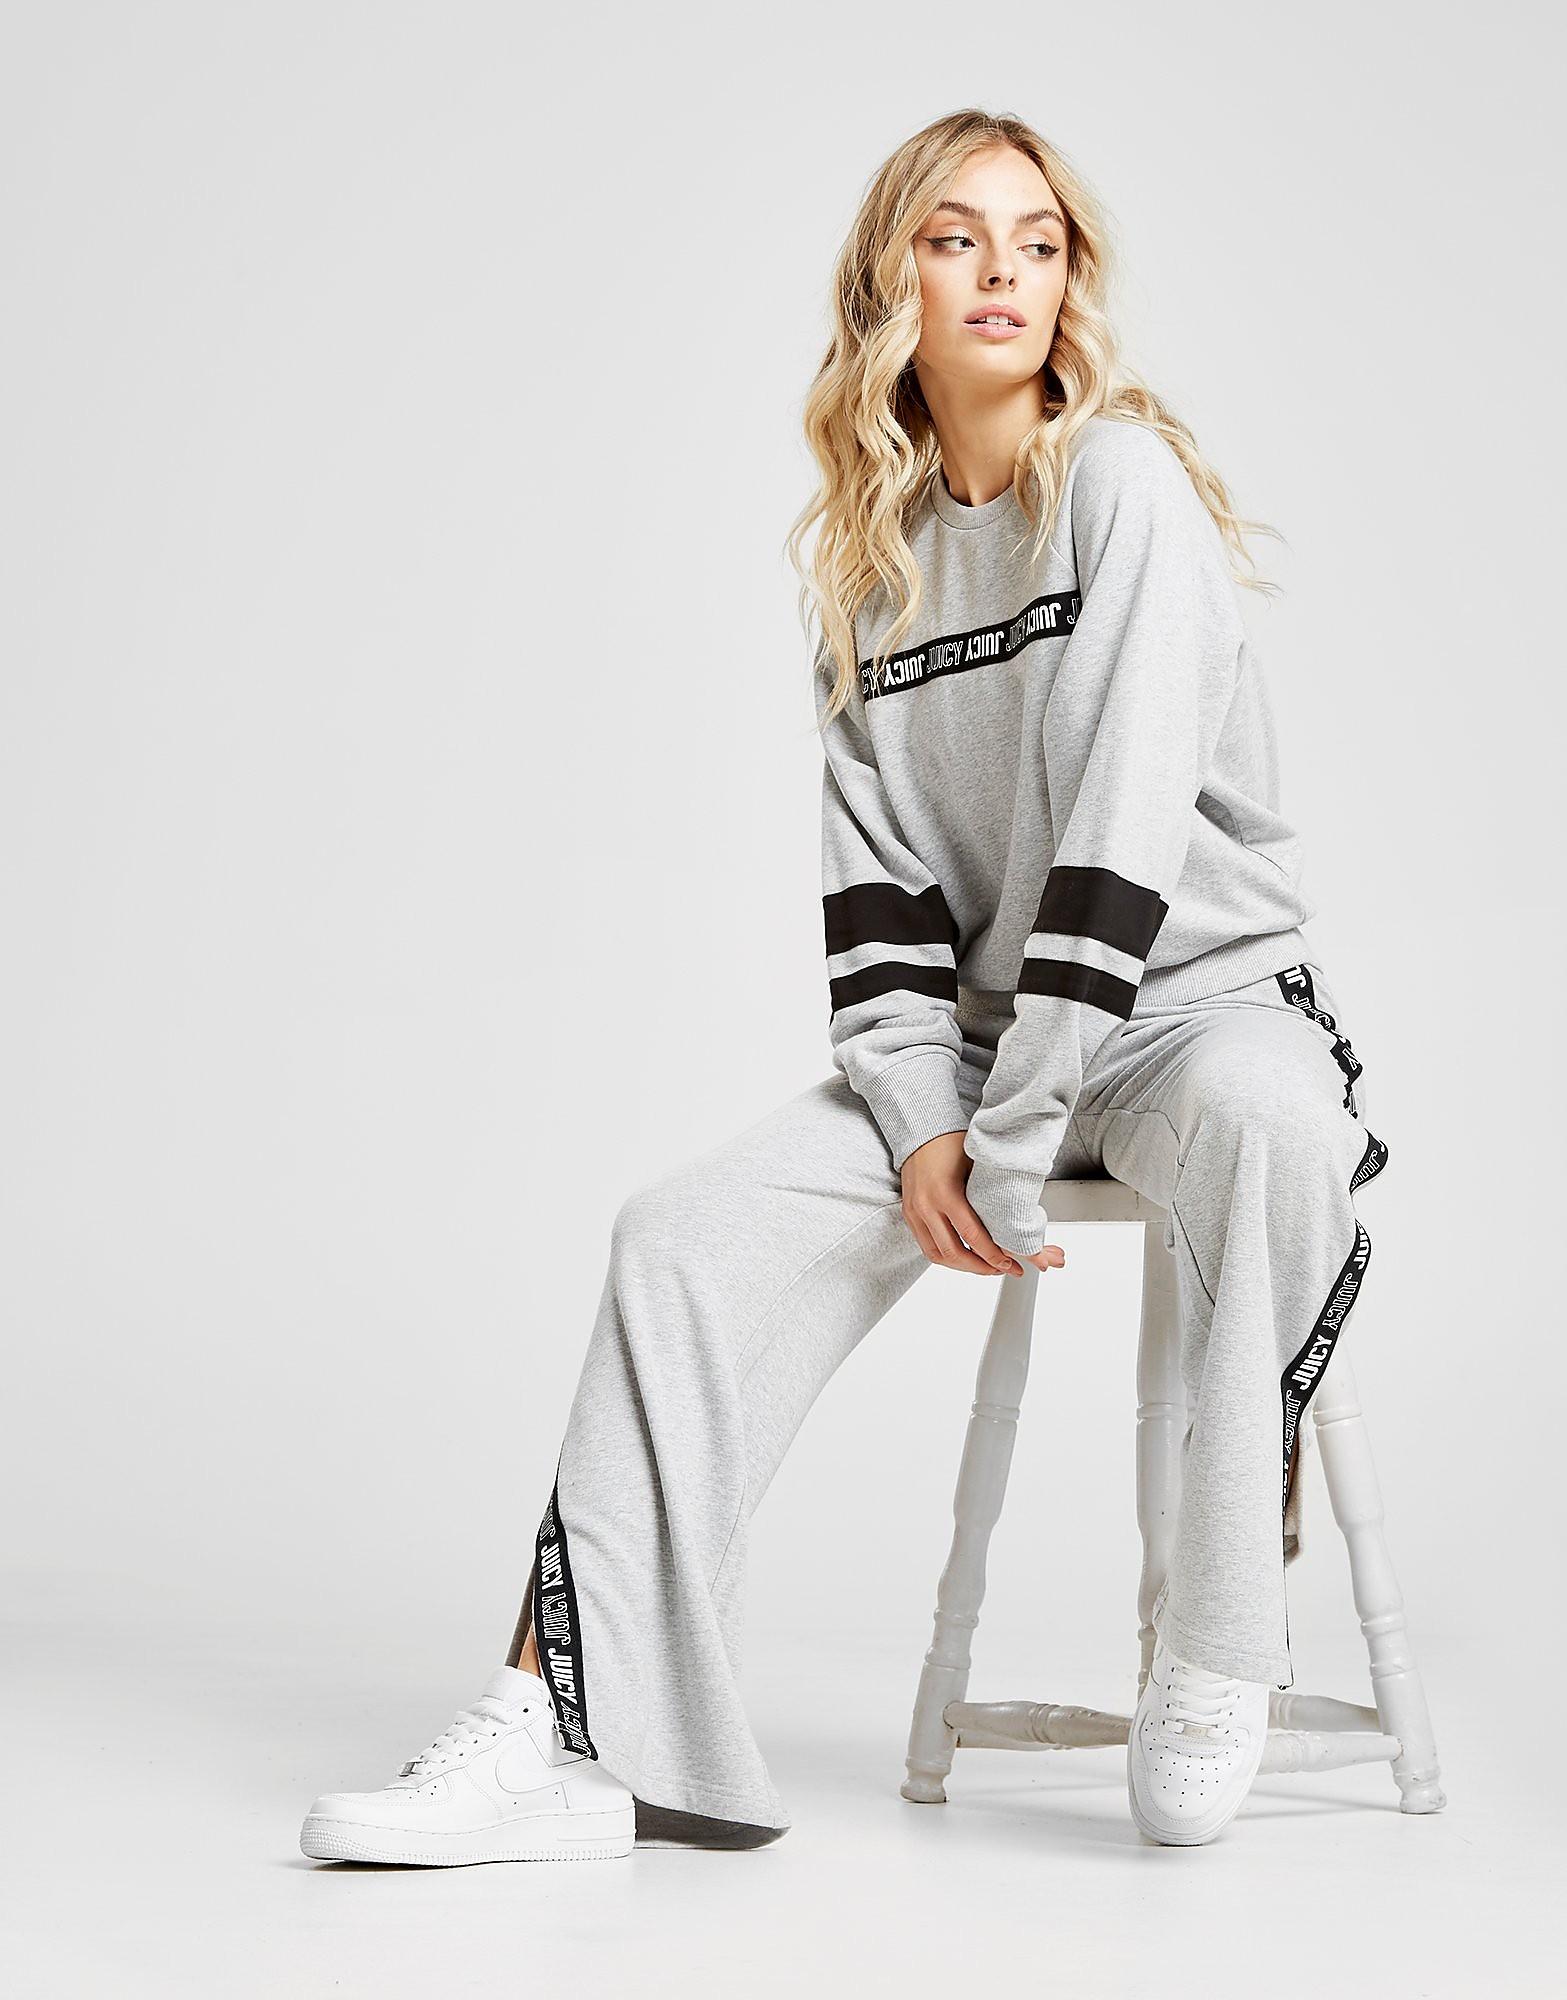 Juicy by Juicy Couture Tape Wide Leg Track Pants - Grijs - Dames